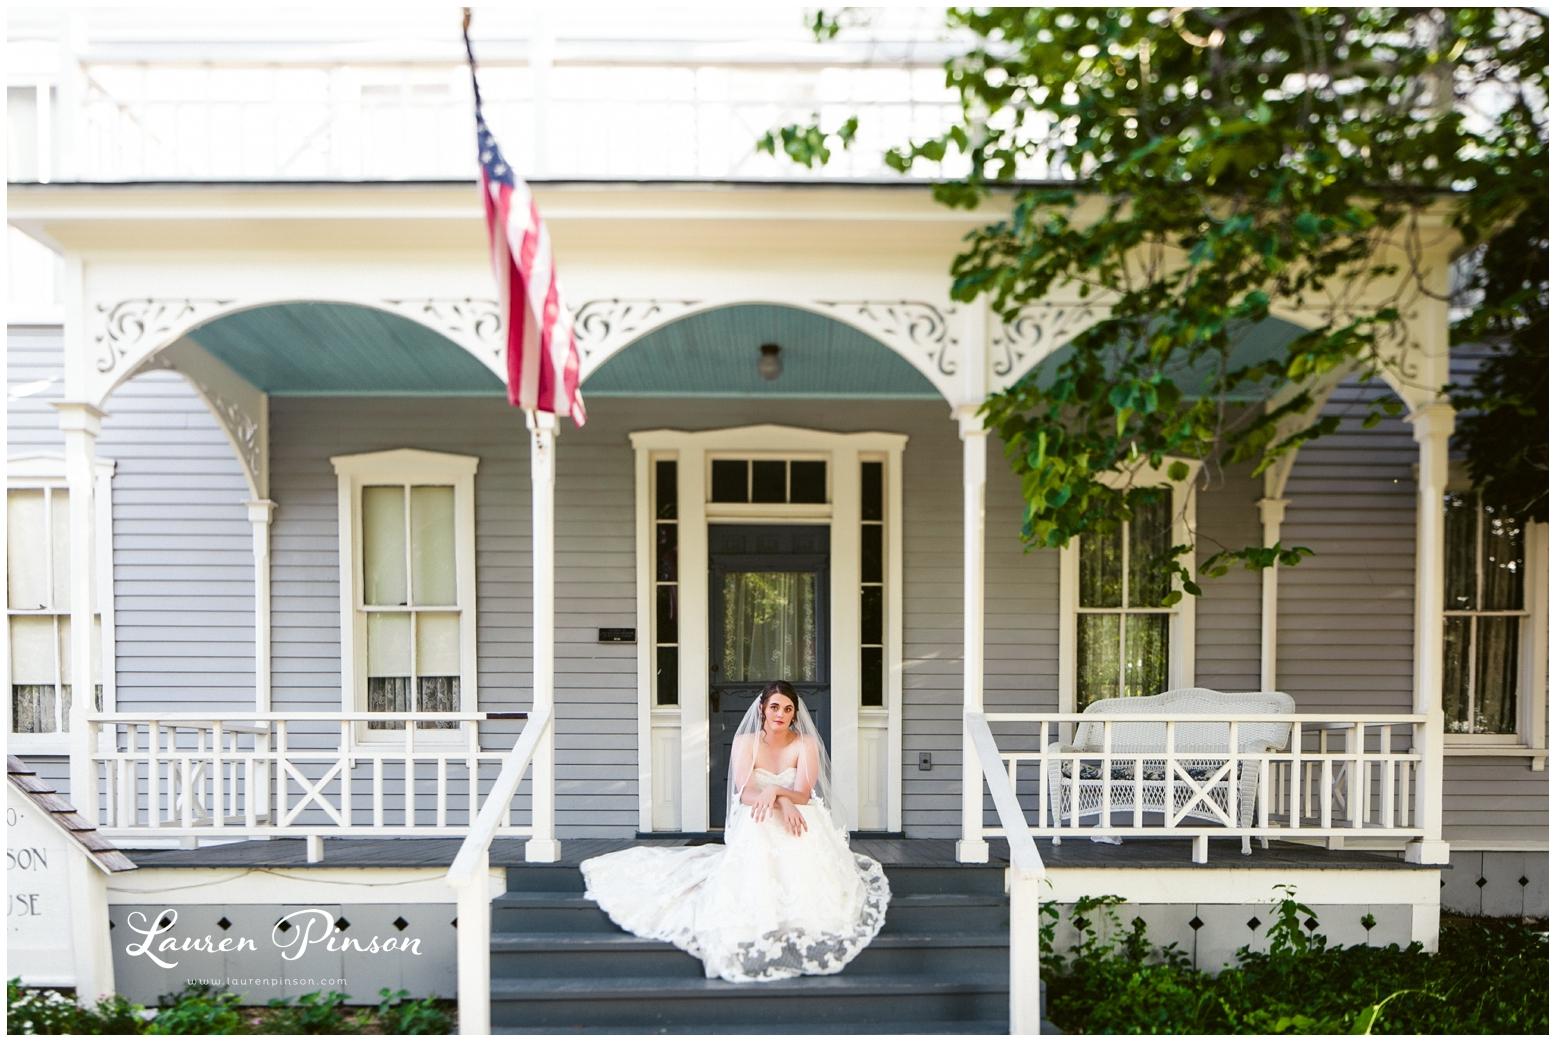 chestnut-square-downtown-mckinney-texas-wedding-photographer-sherman-northtexas-bridal-portraits-photography_0212.jpg